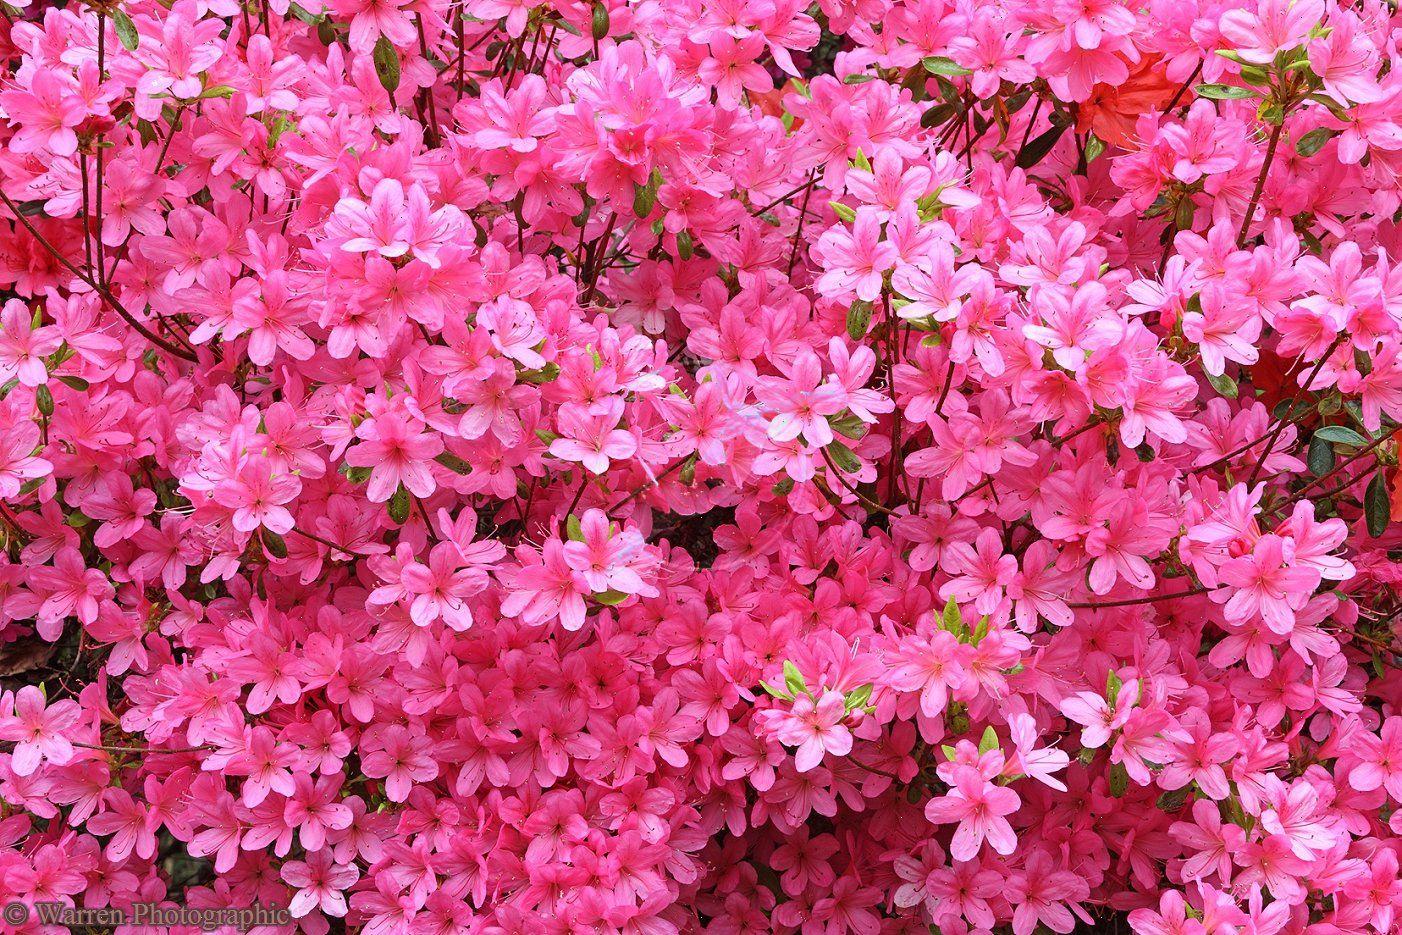 Pink Azalea Flower Pink Azaleas Flower Images